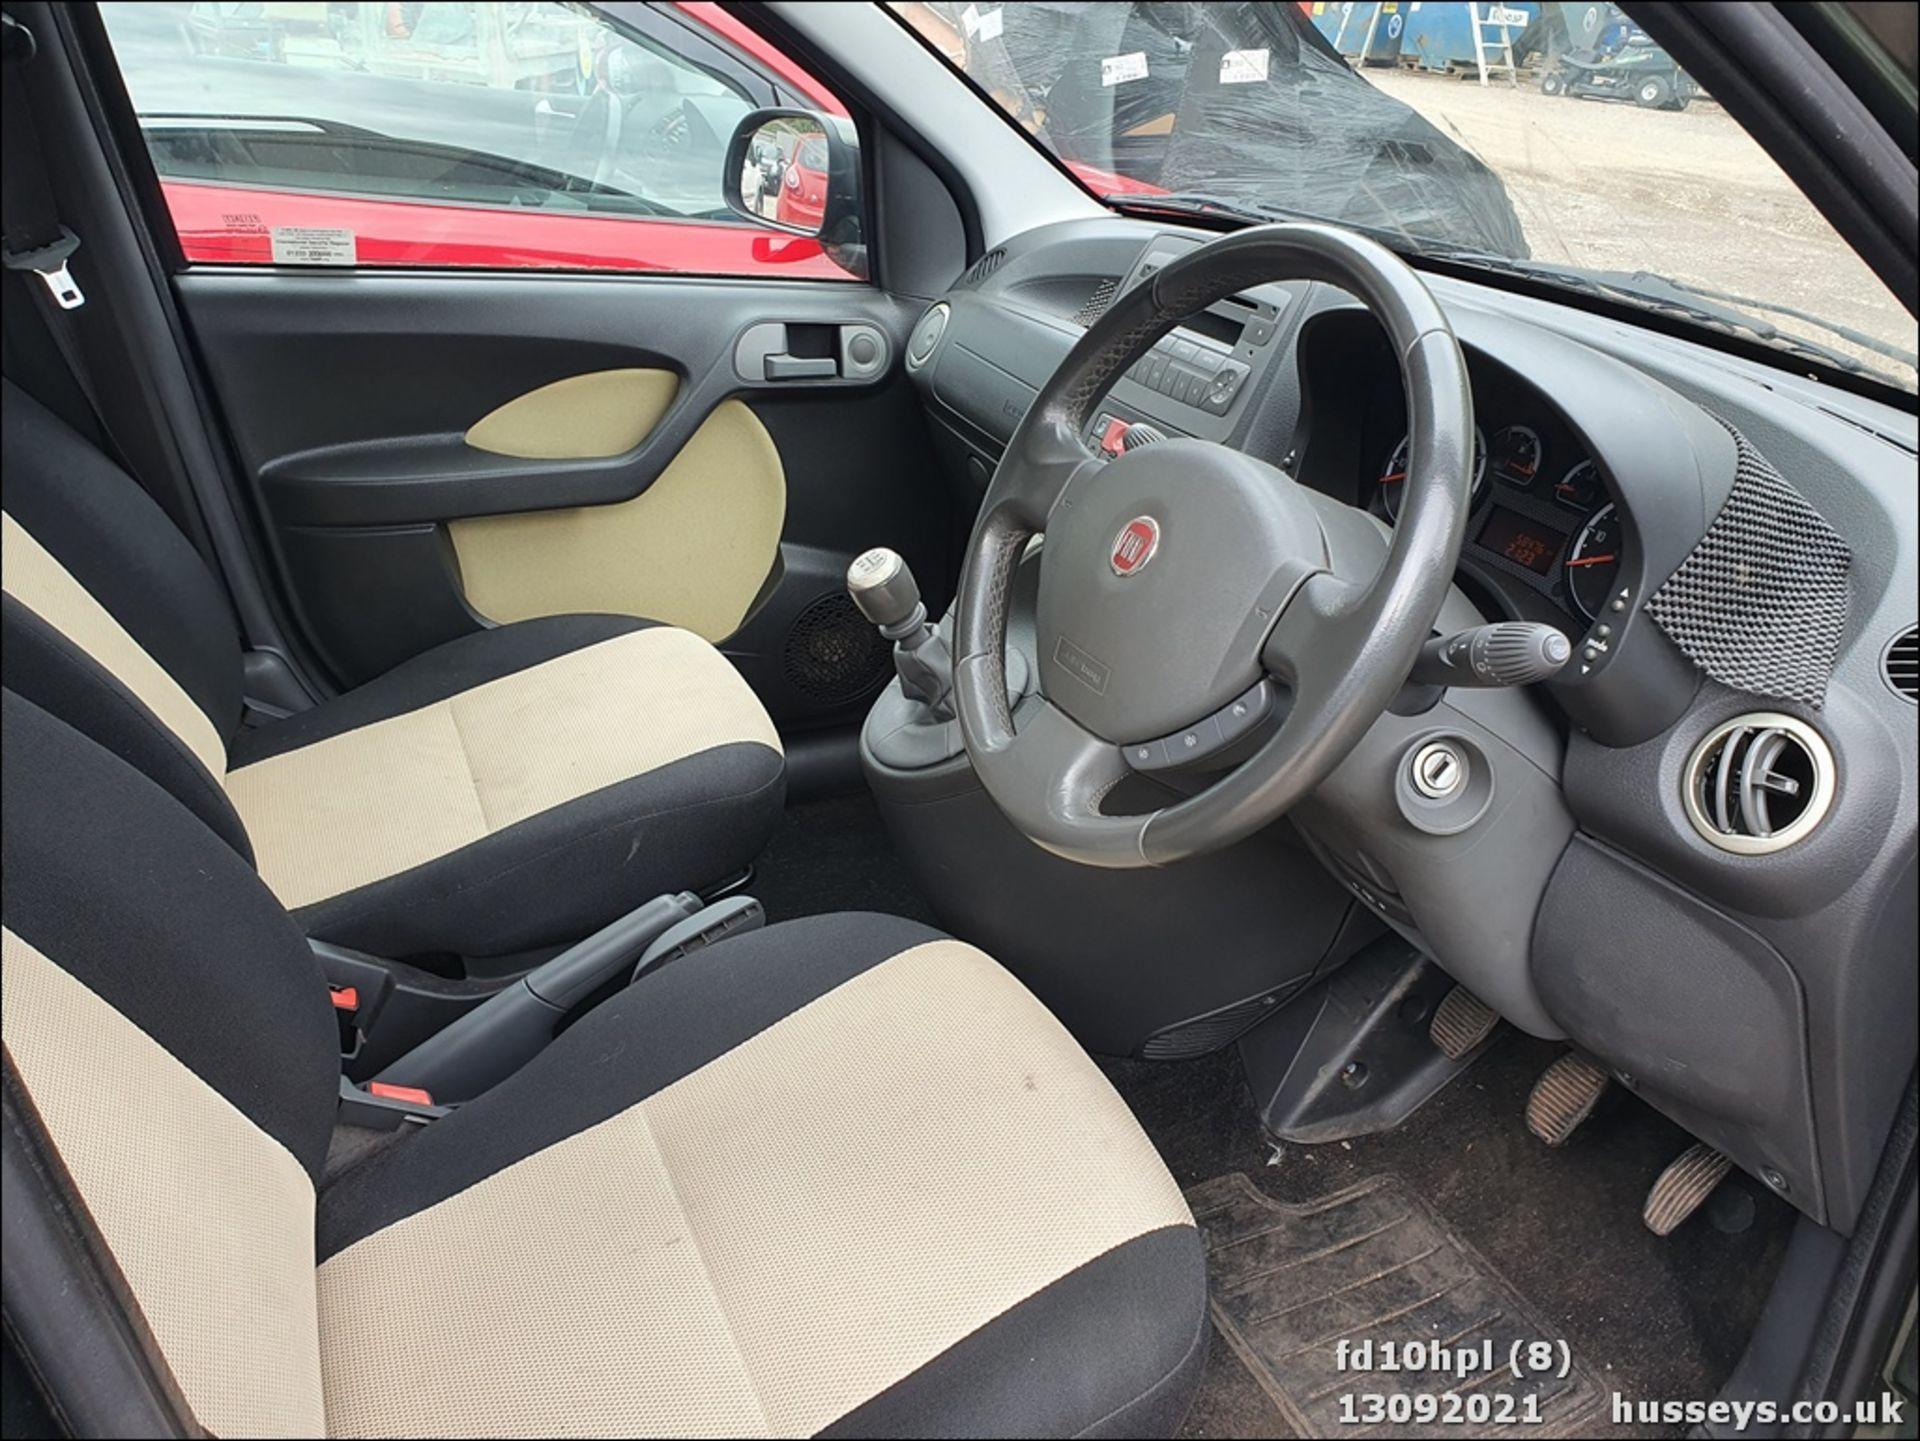 10/10 FIAT PANDA CROSS M-JET 4X4 - 1248cc 5dr Hatchback (Green, 58k) - Image 8 of 15